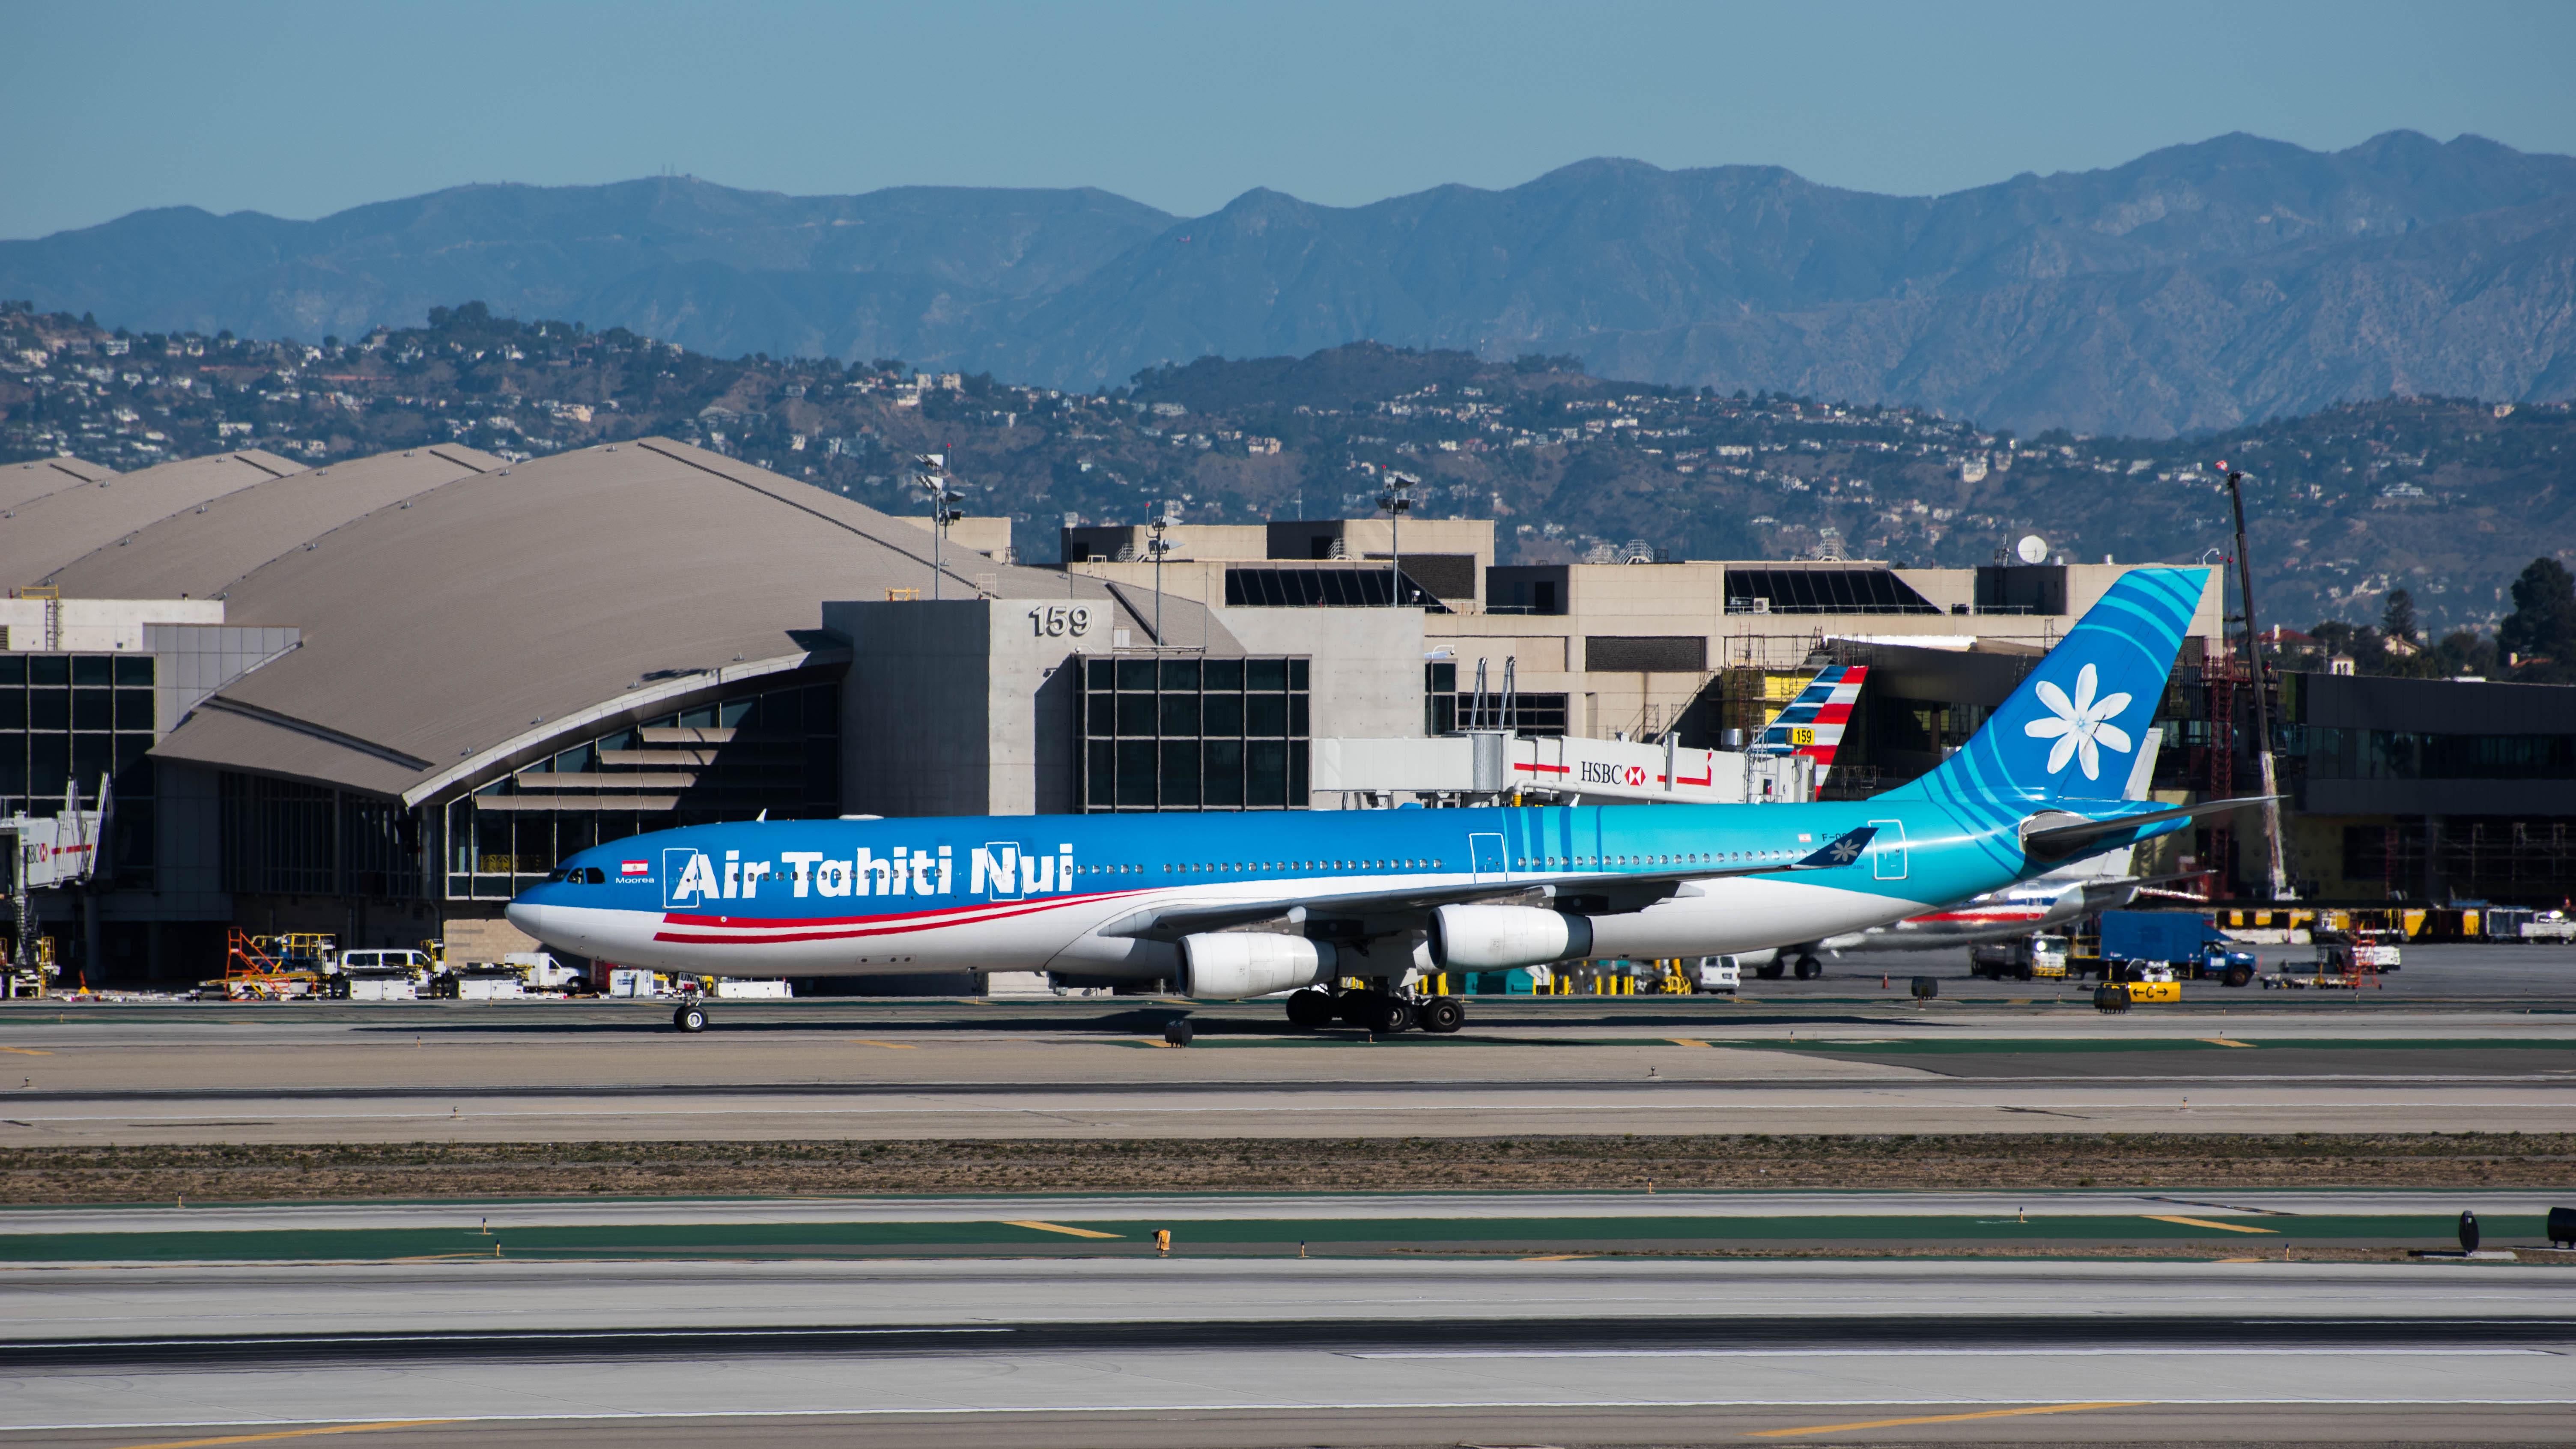 File:Air Tahiti Nui Airbus A340 at LAX (22747769210) jpg - Wikimedia